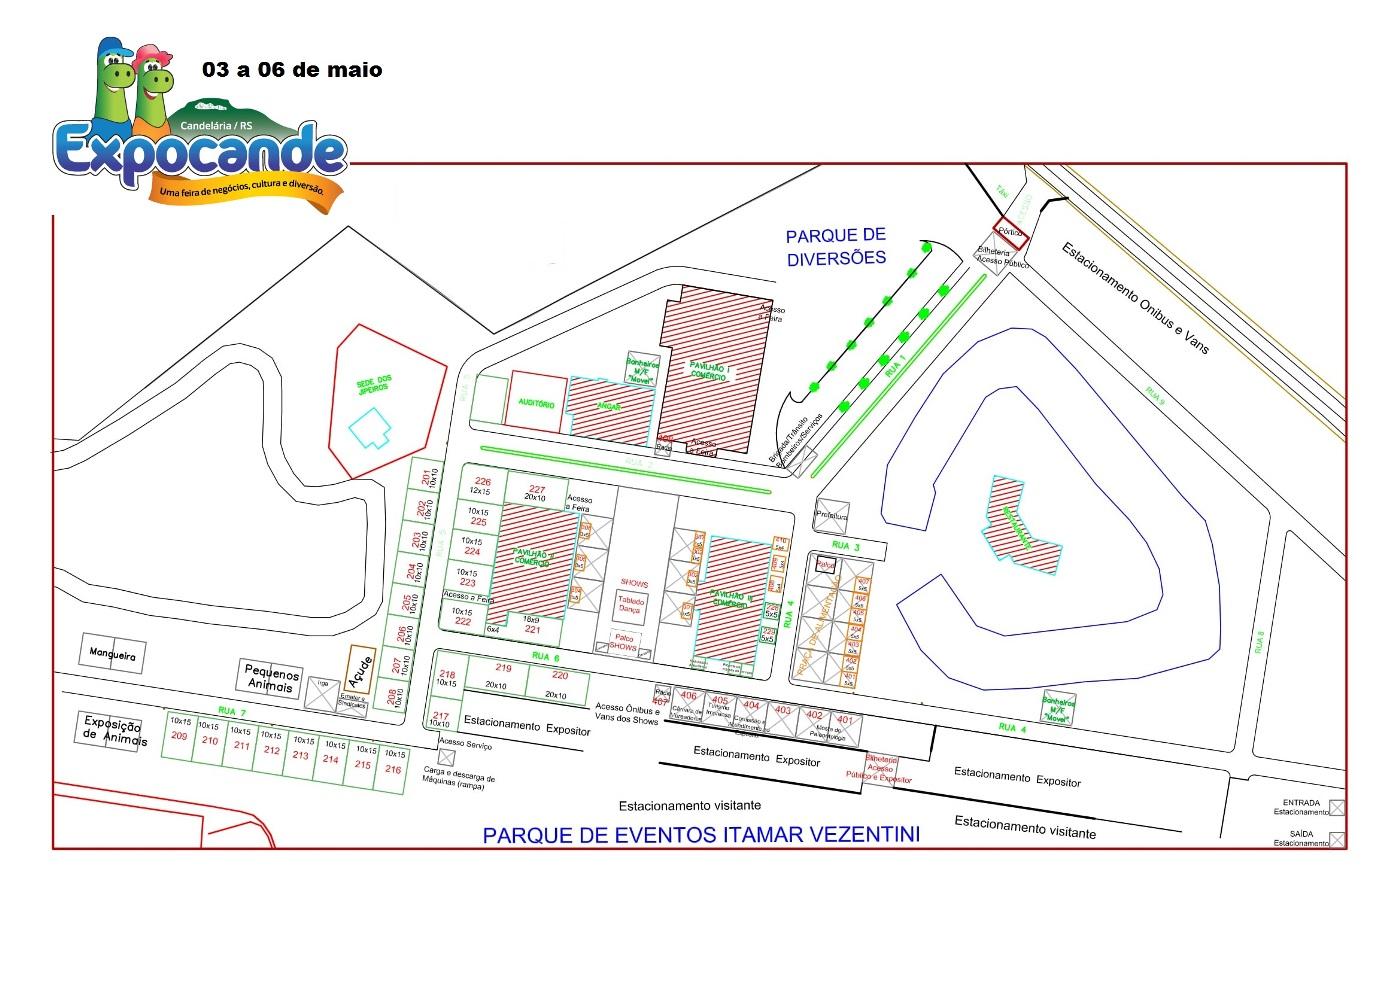 mapa-geral-expocande-2018-1